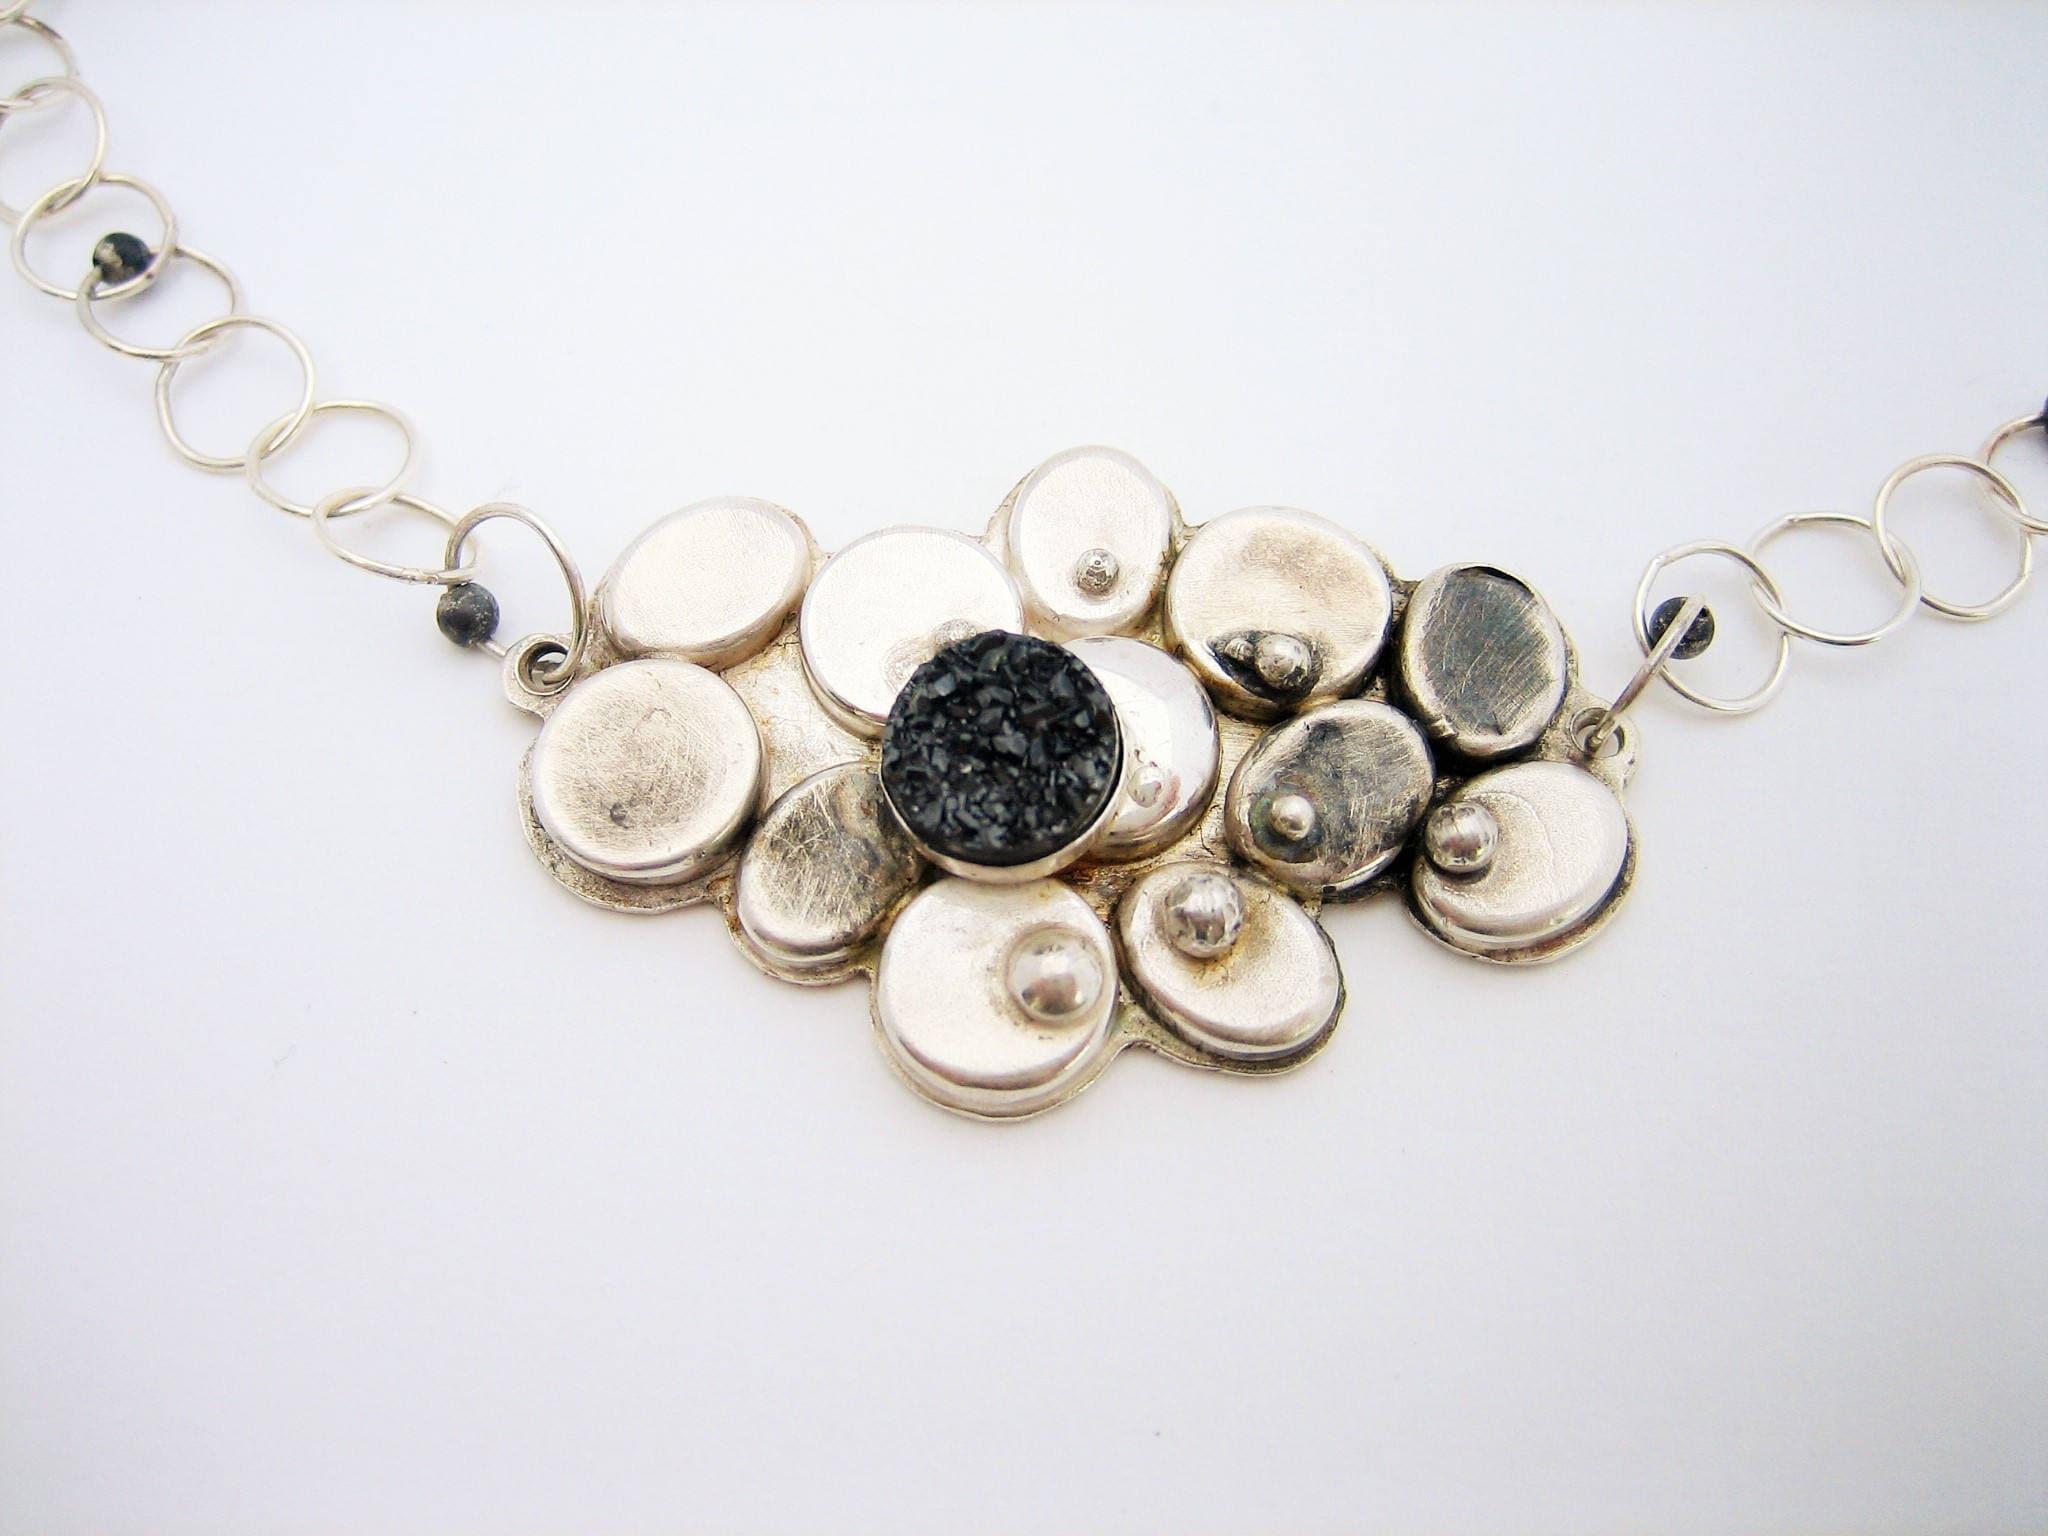 Silver flower necklace with silver druzy quartz, blackened silver artisan necklace, pod necklace, statement flower necklace, modern flower